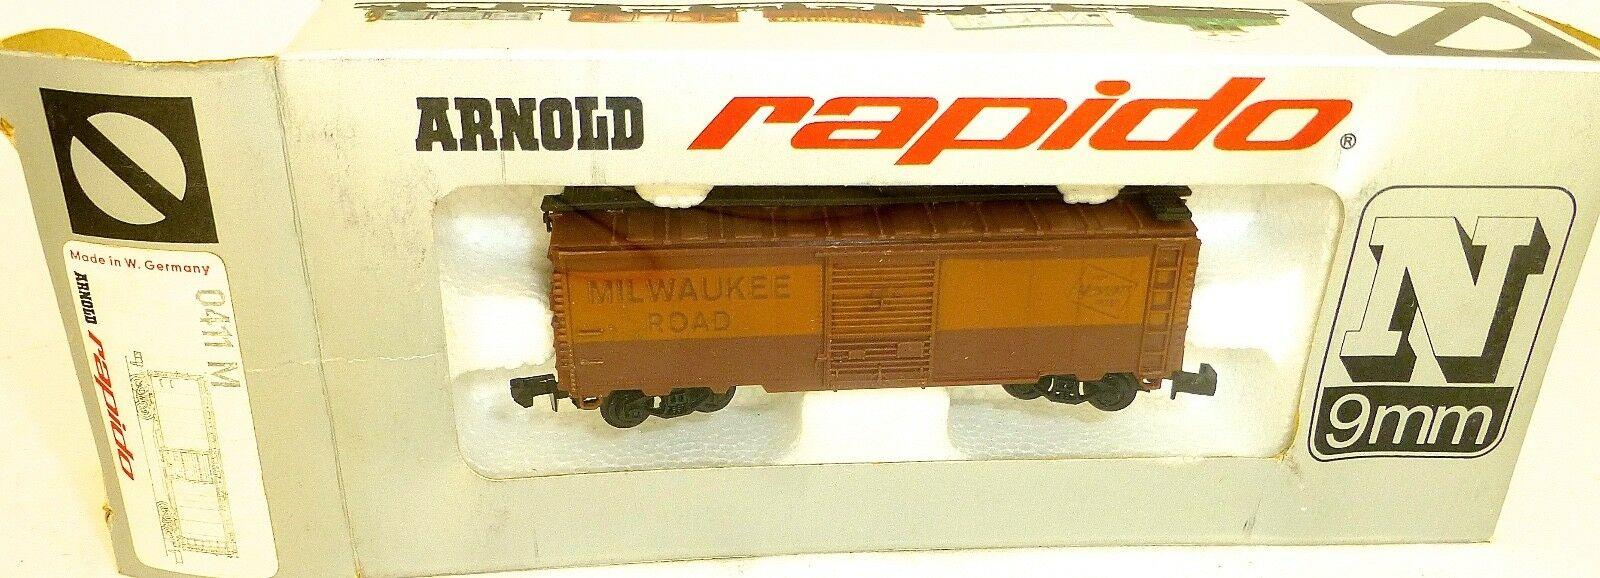 N Scale - Arnold - 0411M - Boxcar, 40 Foot, AAR 1937 - Milwaukee Road